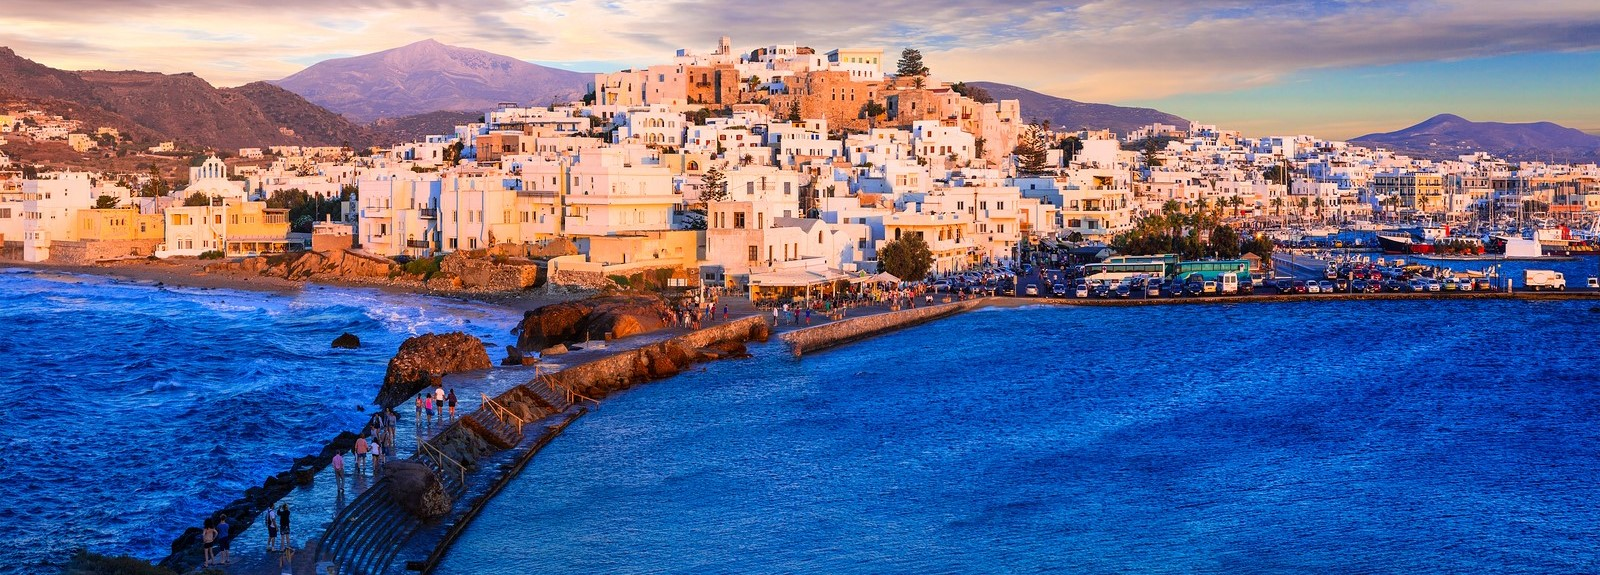 Naxos-island-cyclades2